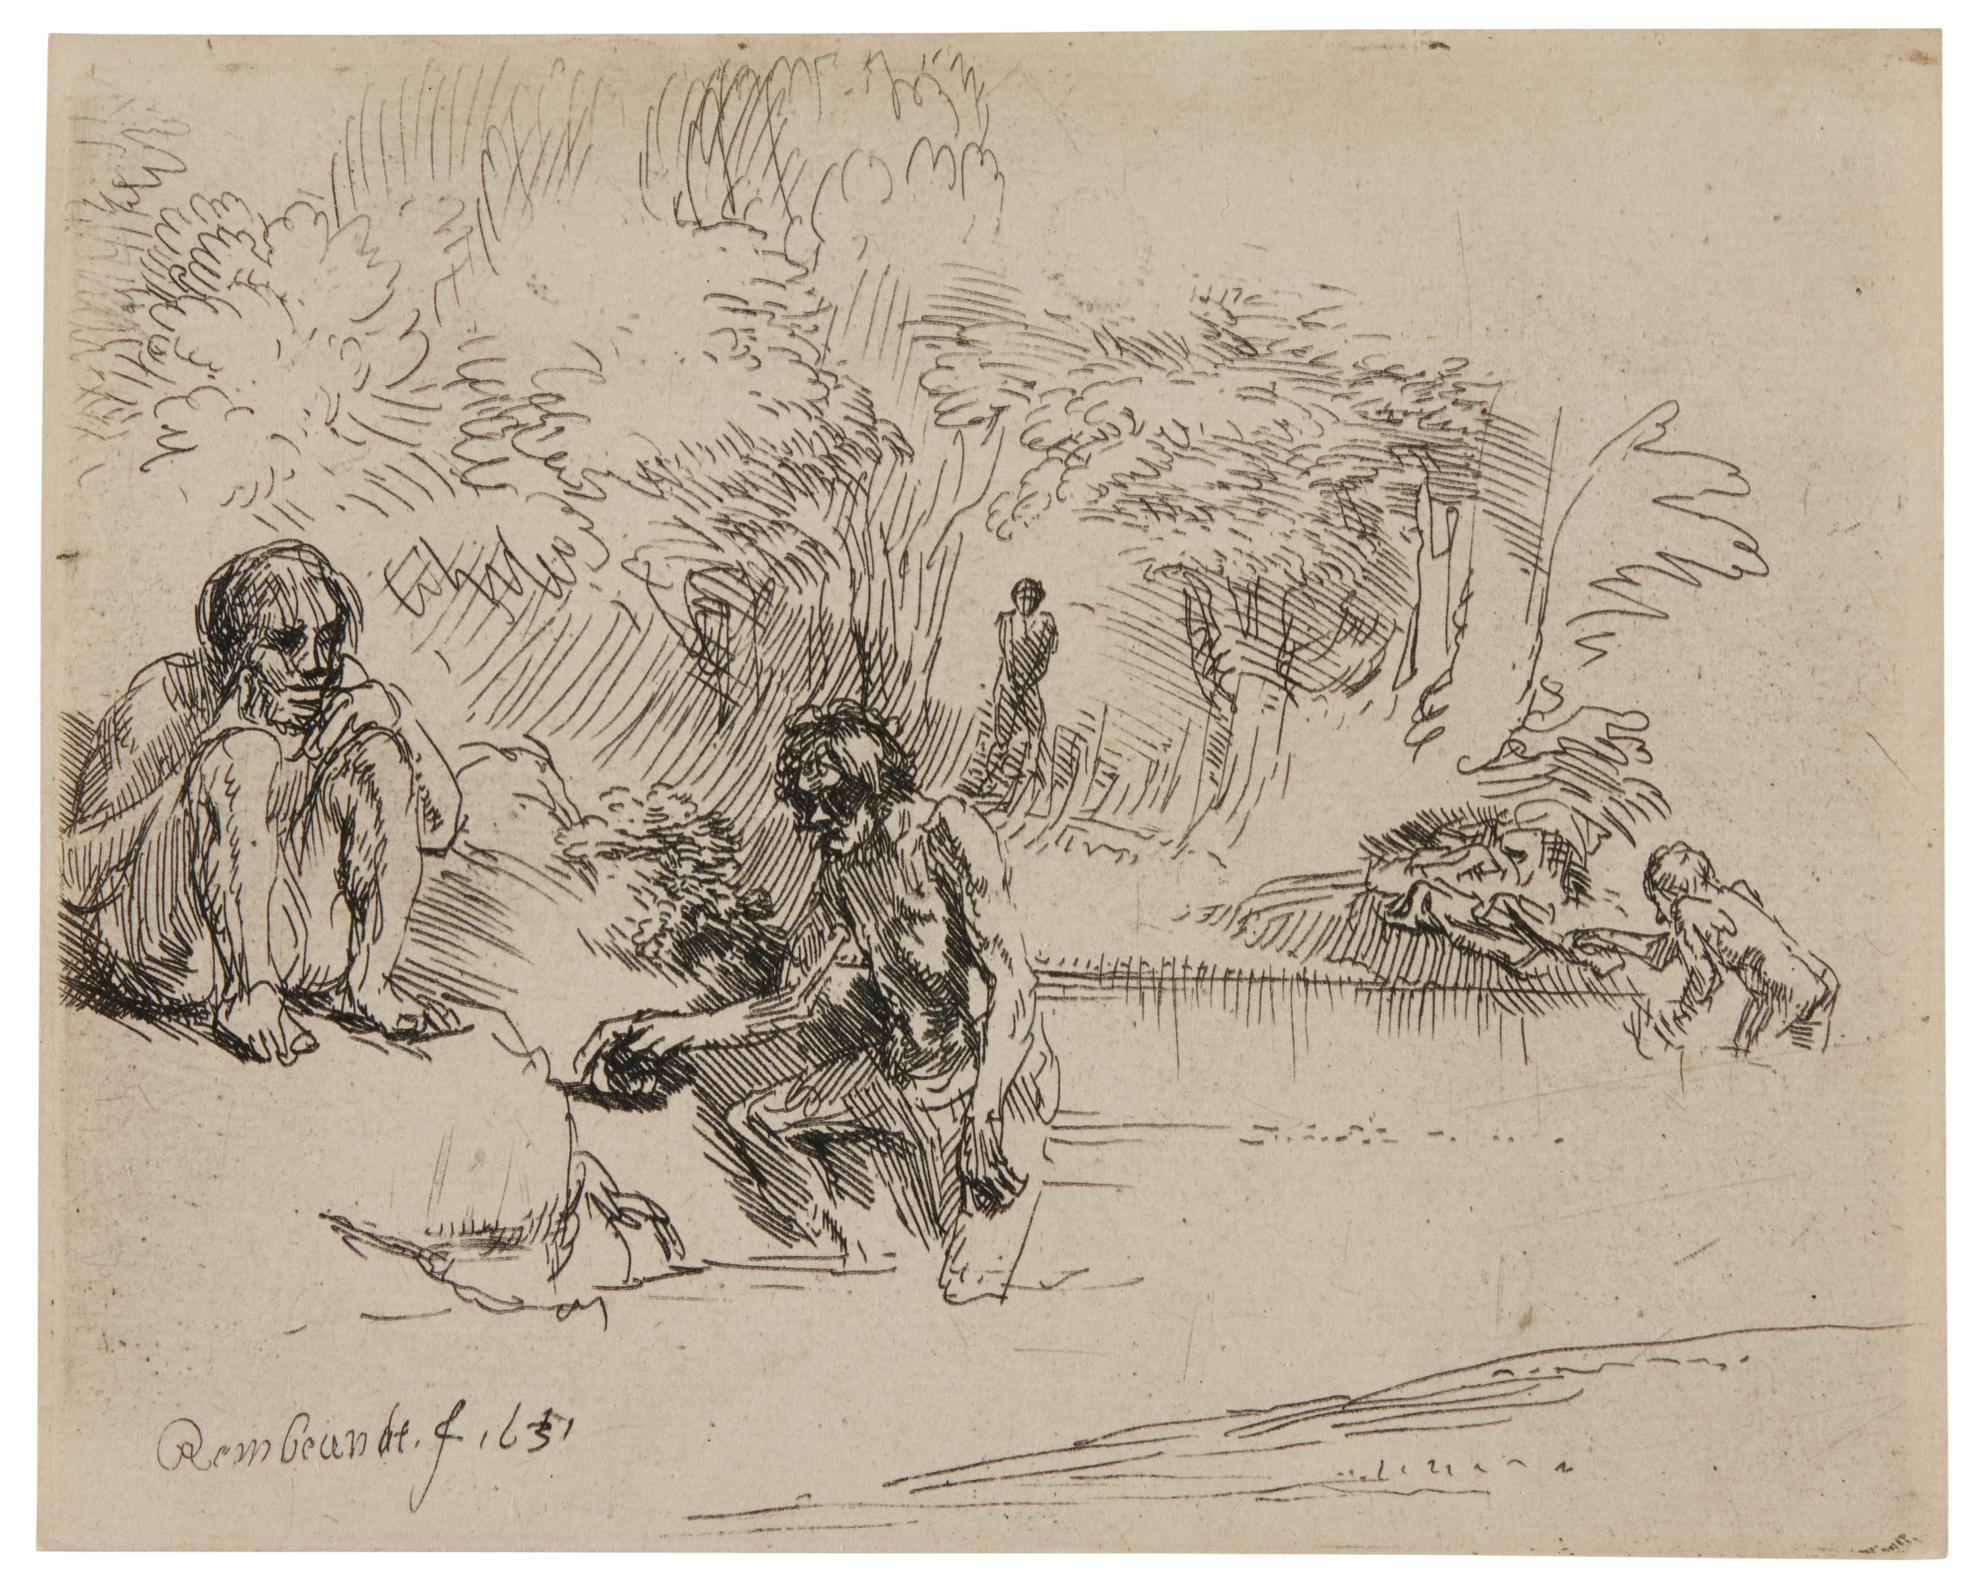 Rembrandt van Rijn-The Bathers (De Zwemmertjes) (B., Holl. 195; New Holl. 258; H. 250)-1651